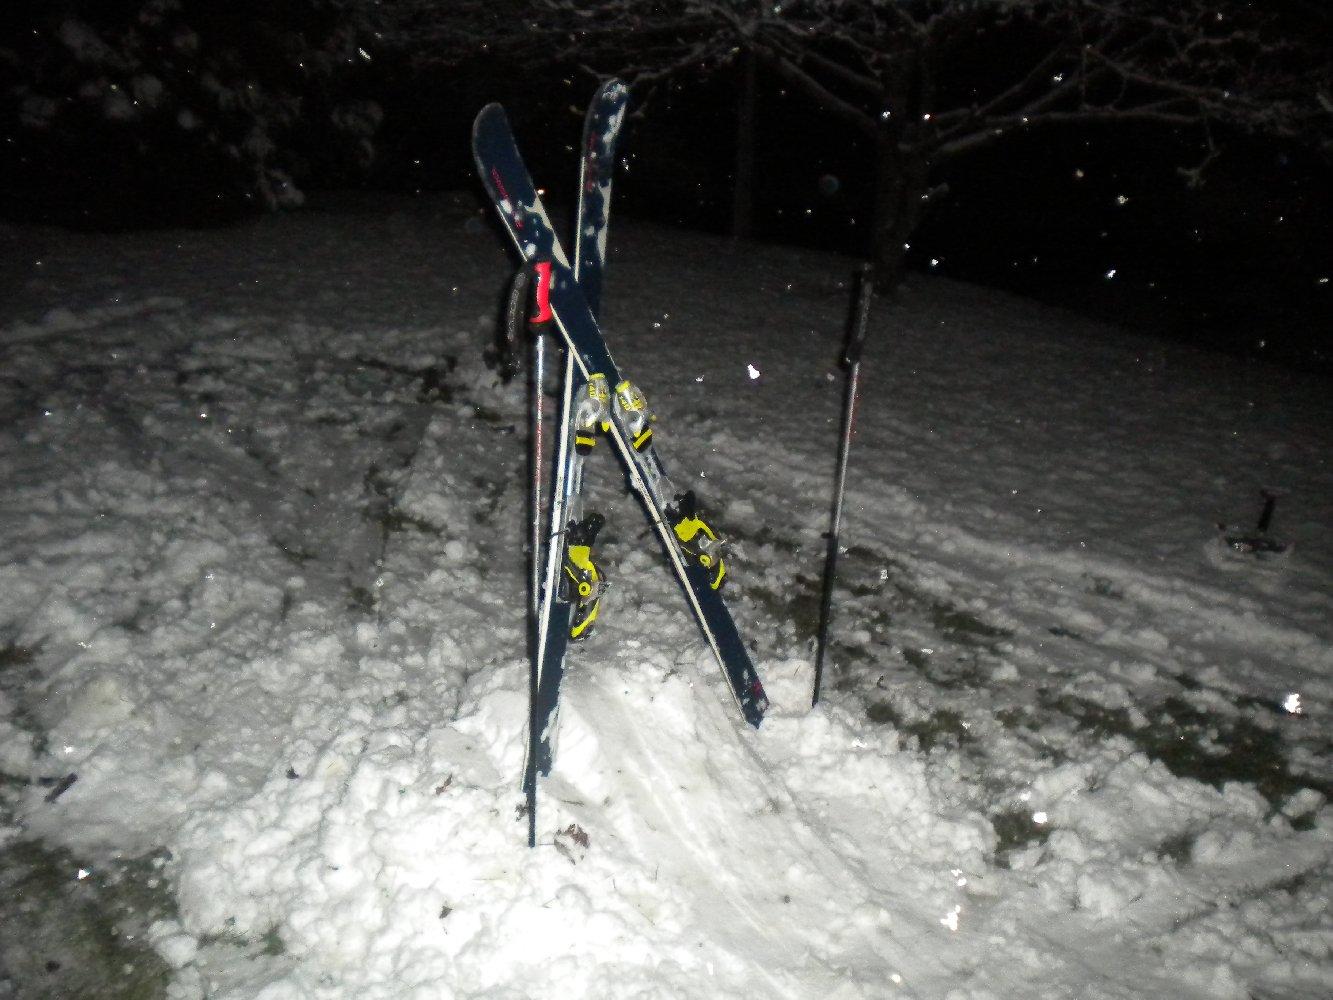 Backyard Skiing on April 18th - 26 of 27